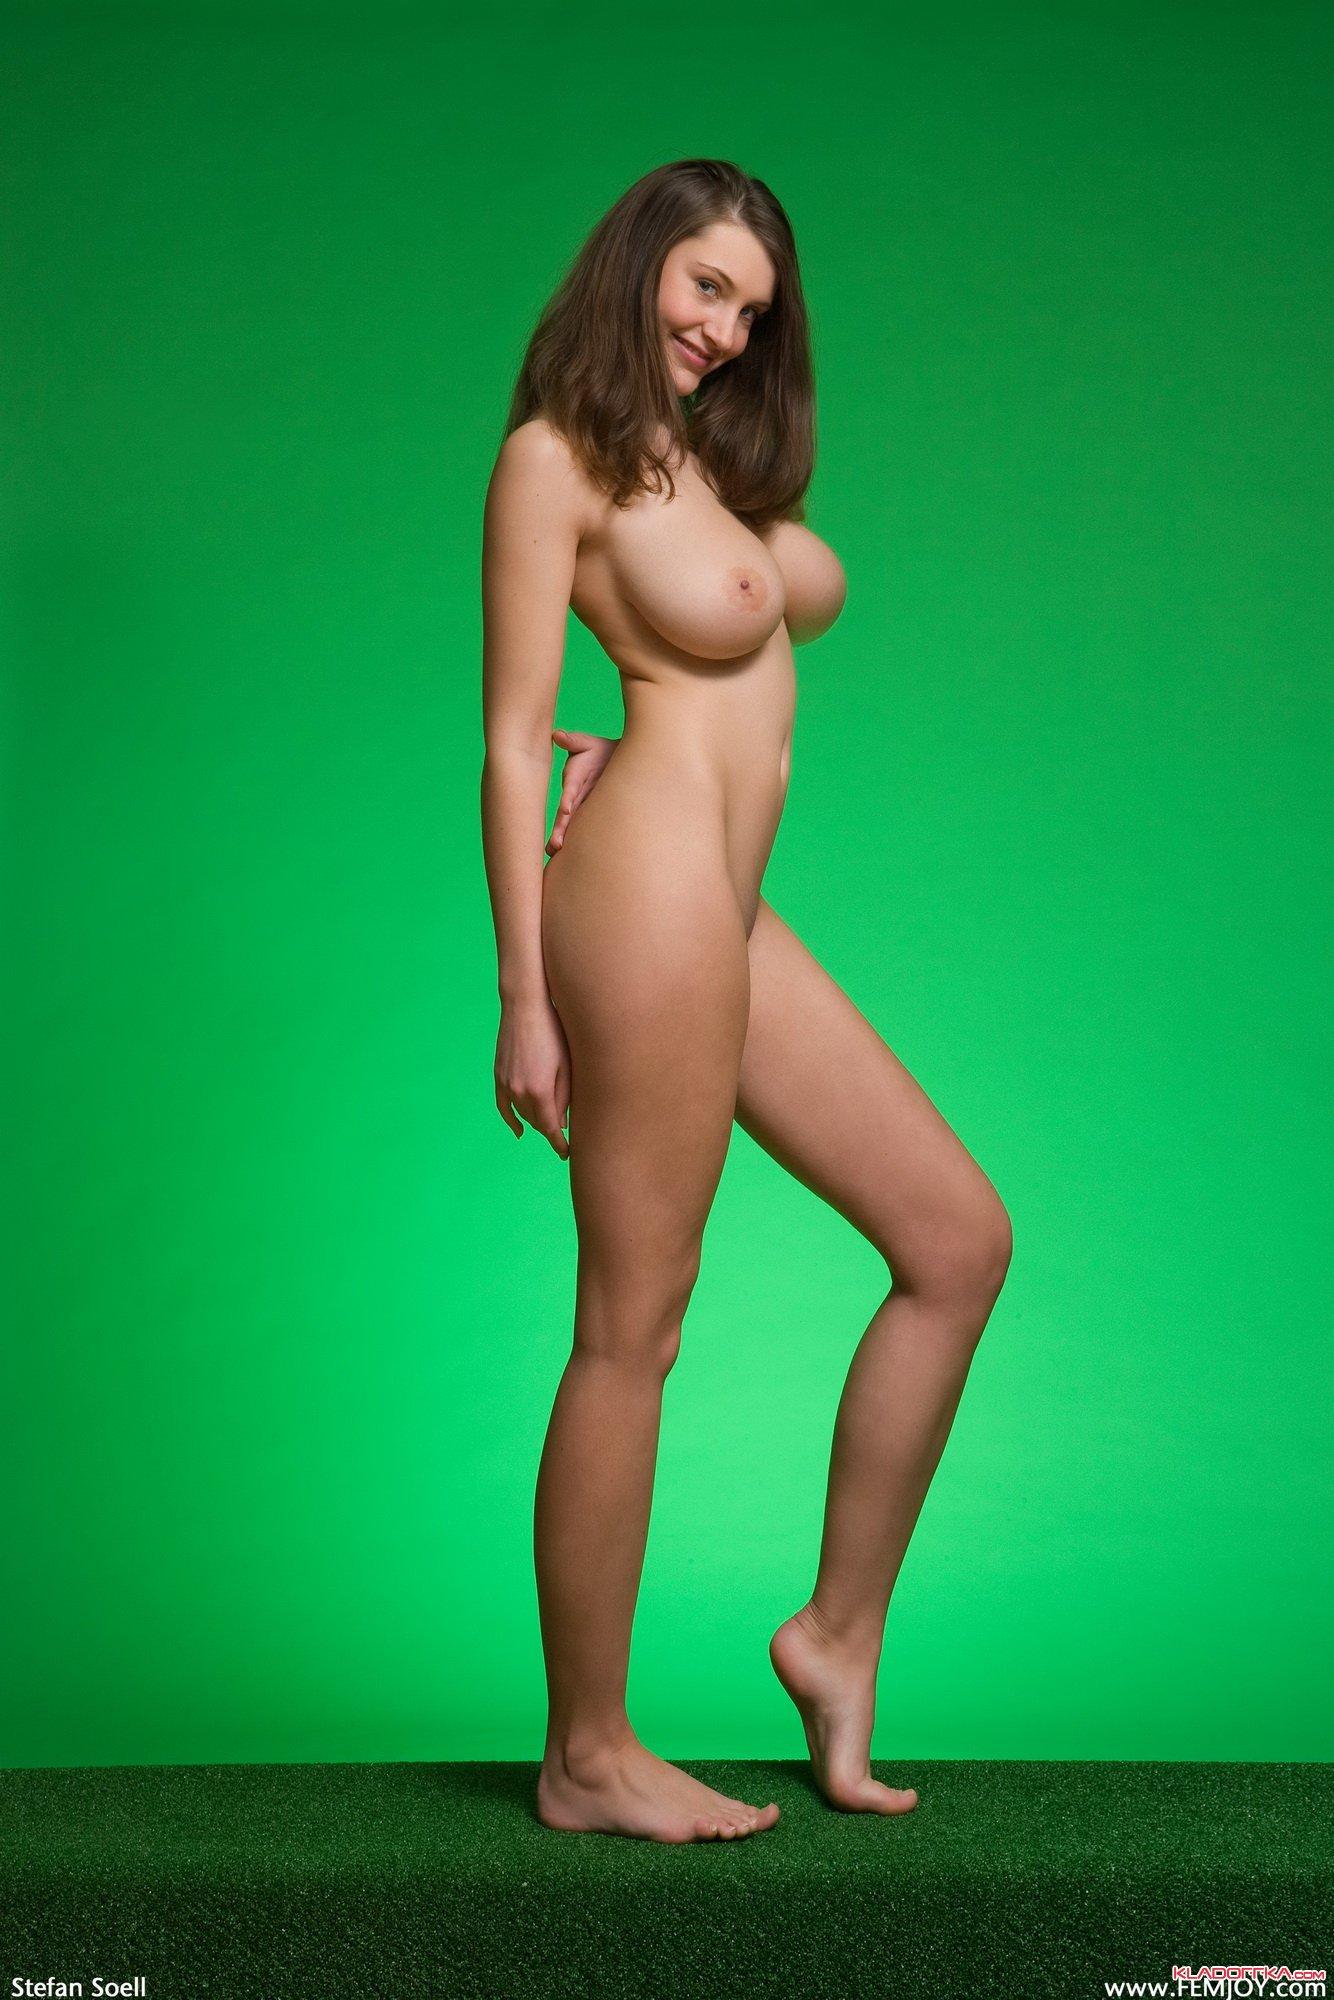 Green Screen Model Nude